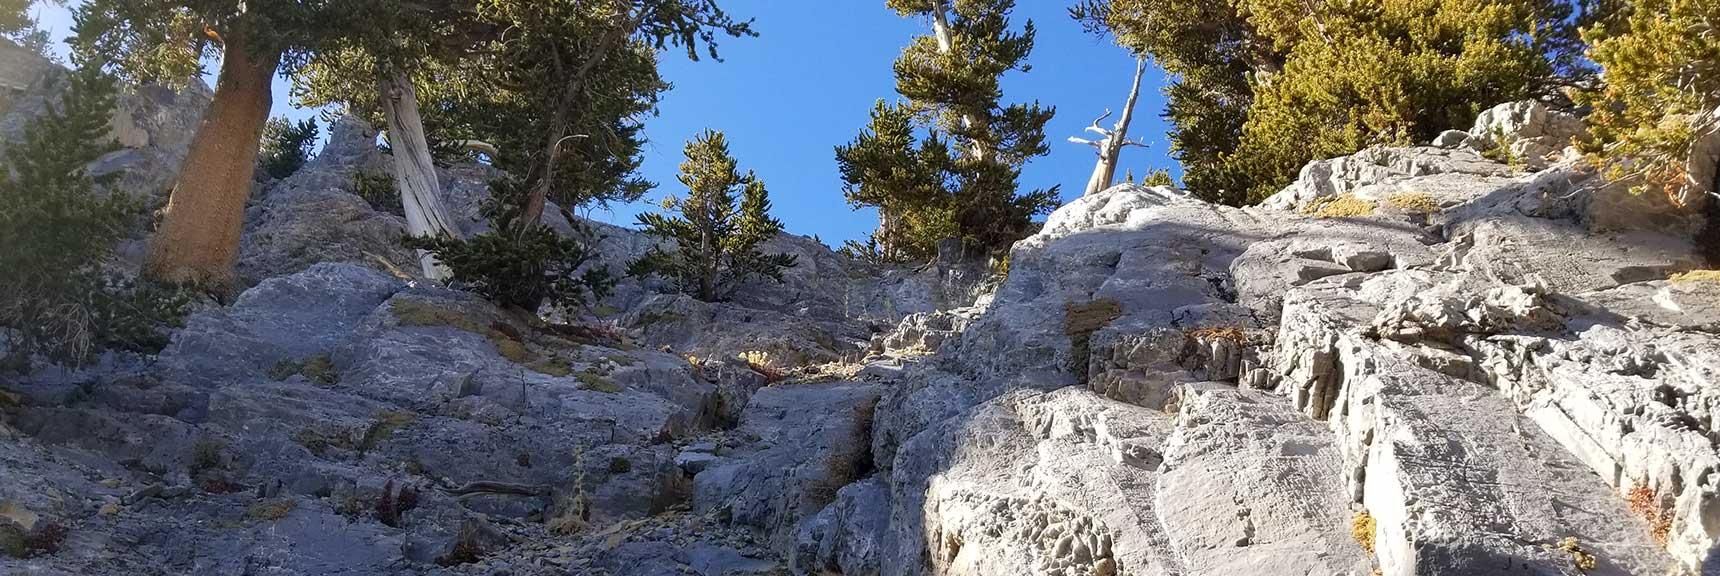 Summit in Sight on the Northeast Final Approach to Mummy Mountain Summit, Nevada